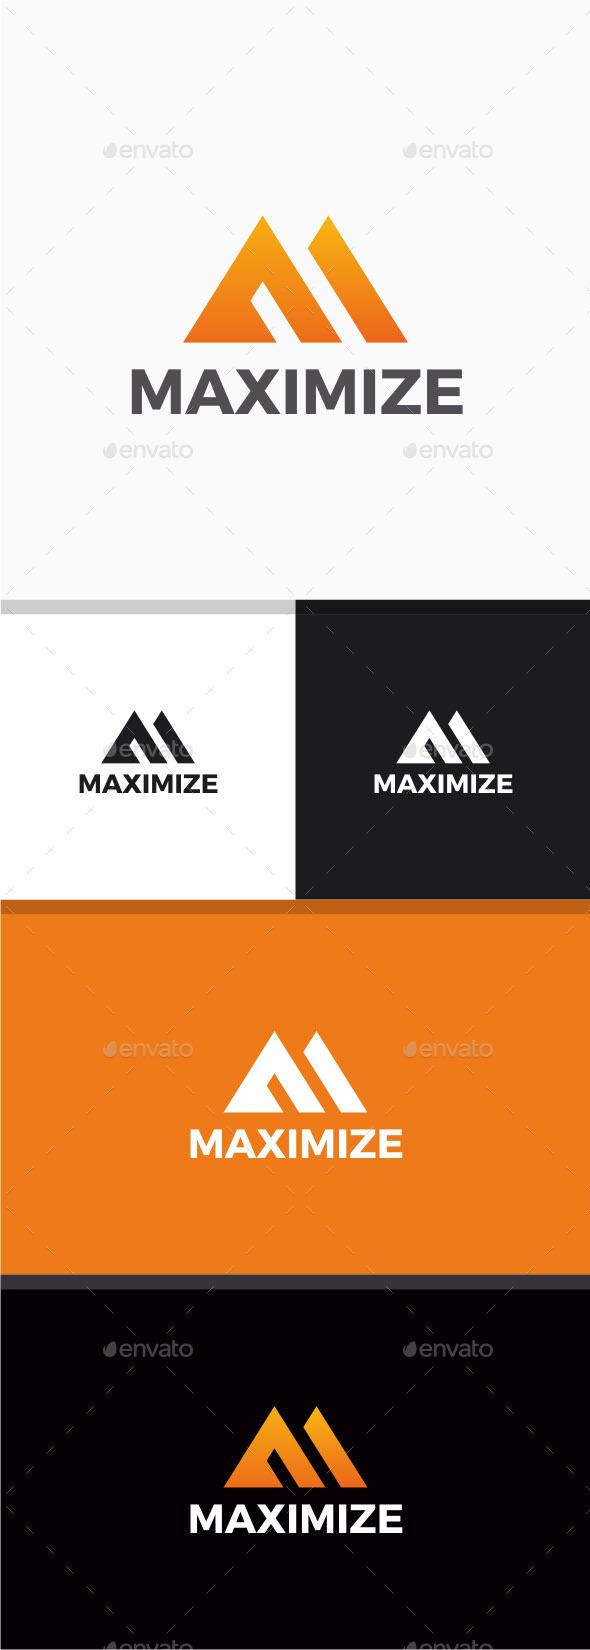 GraphicRiver Maximize logo 10455198